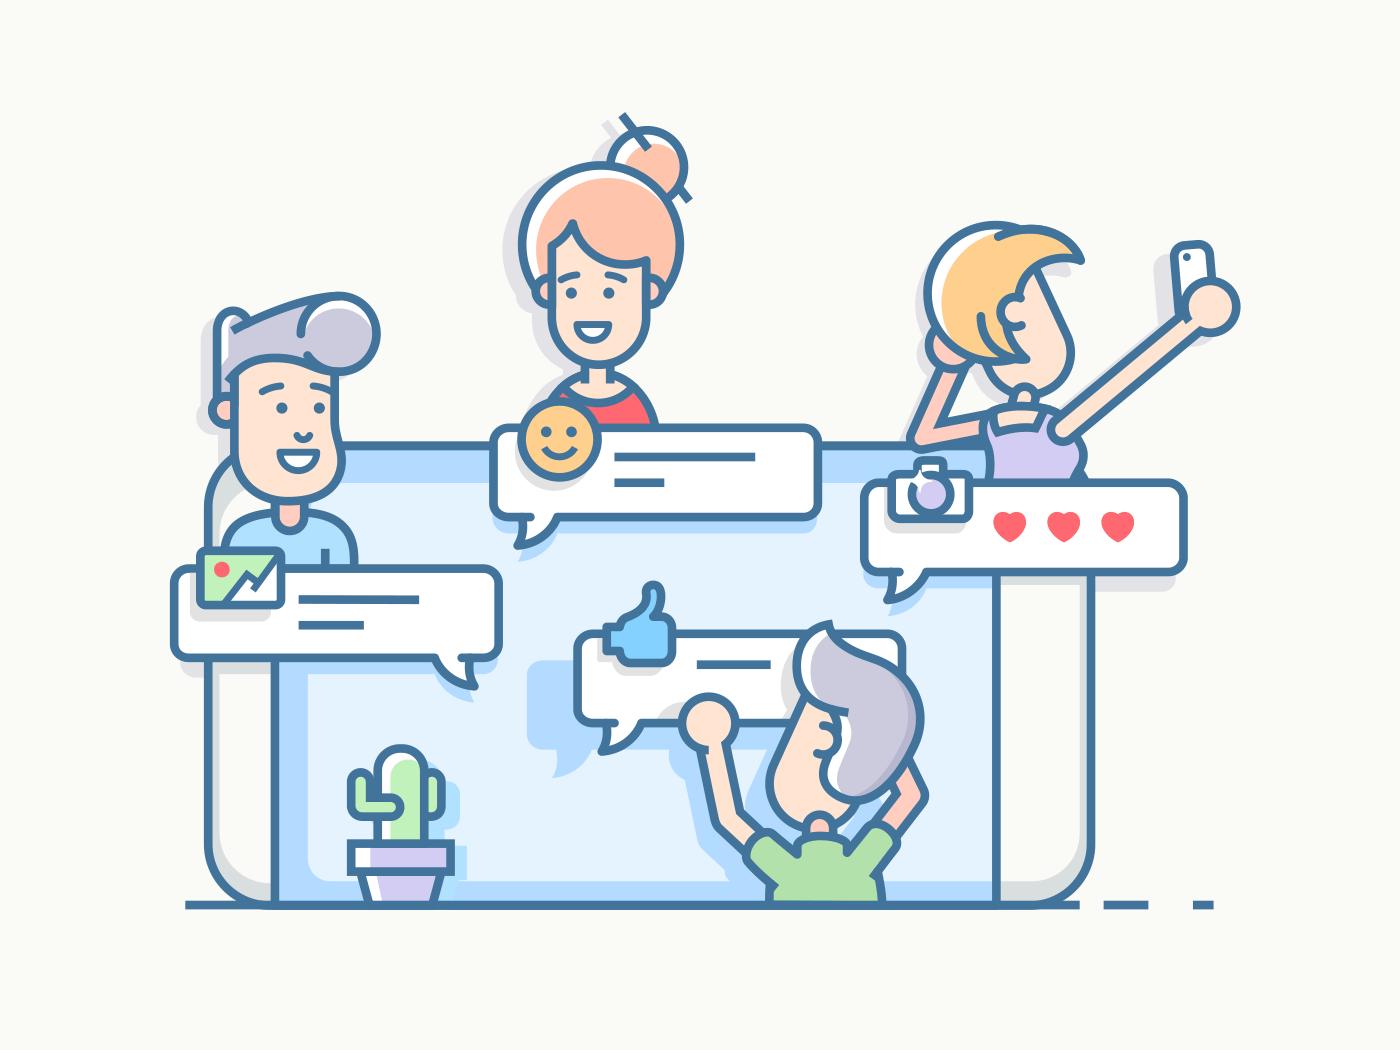 Friends talking in chat app line vector illustration